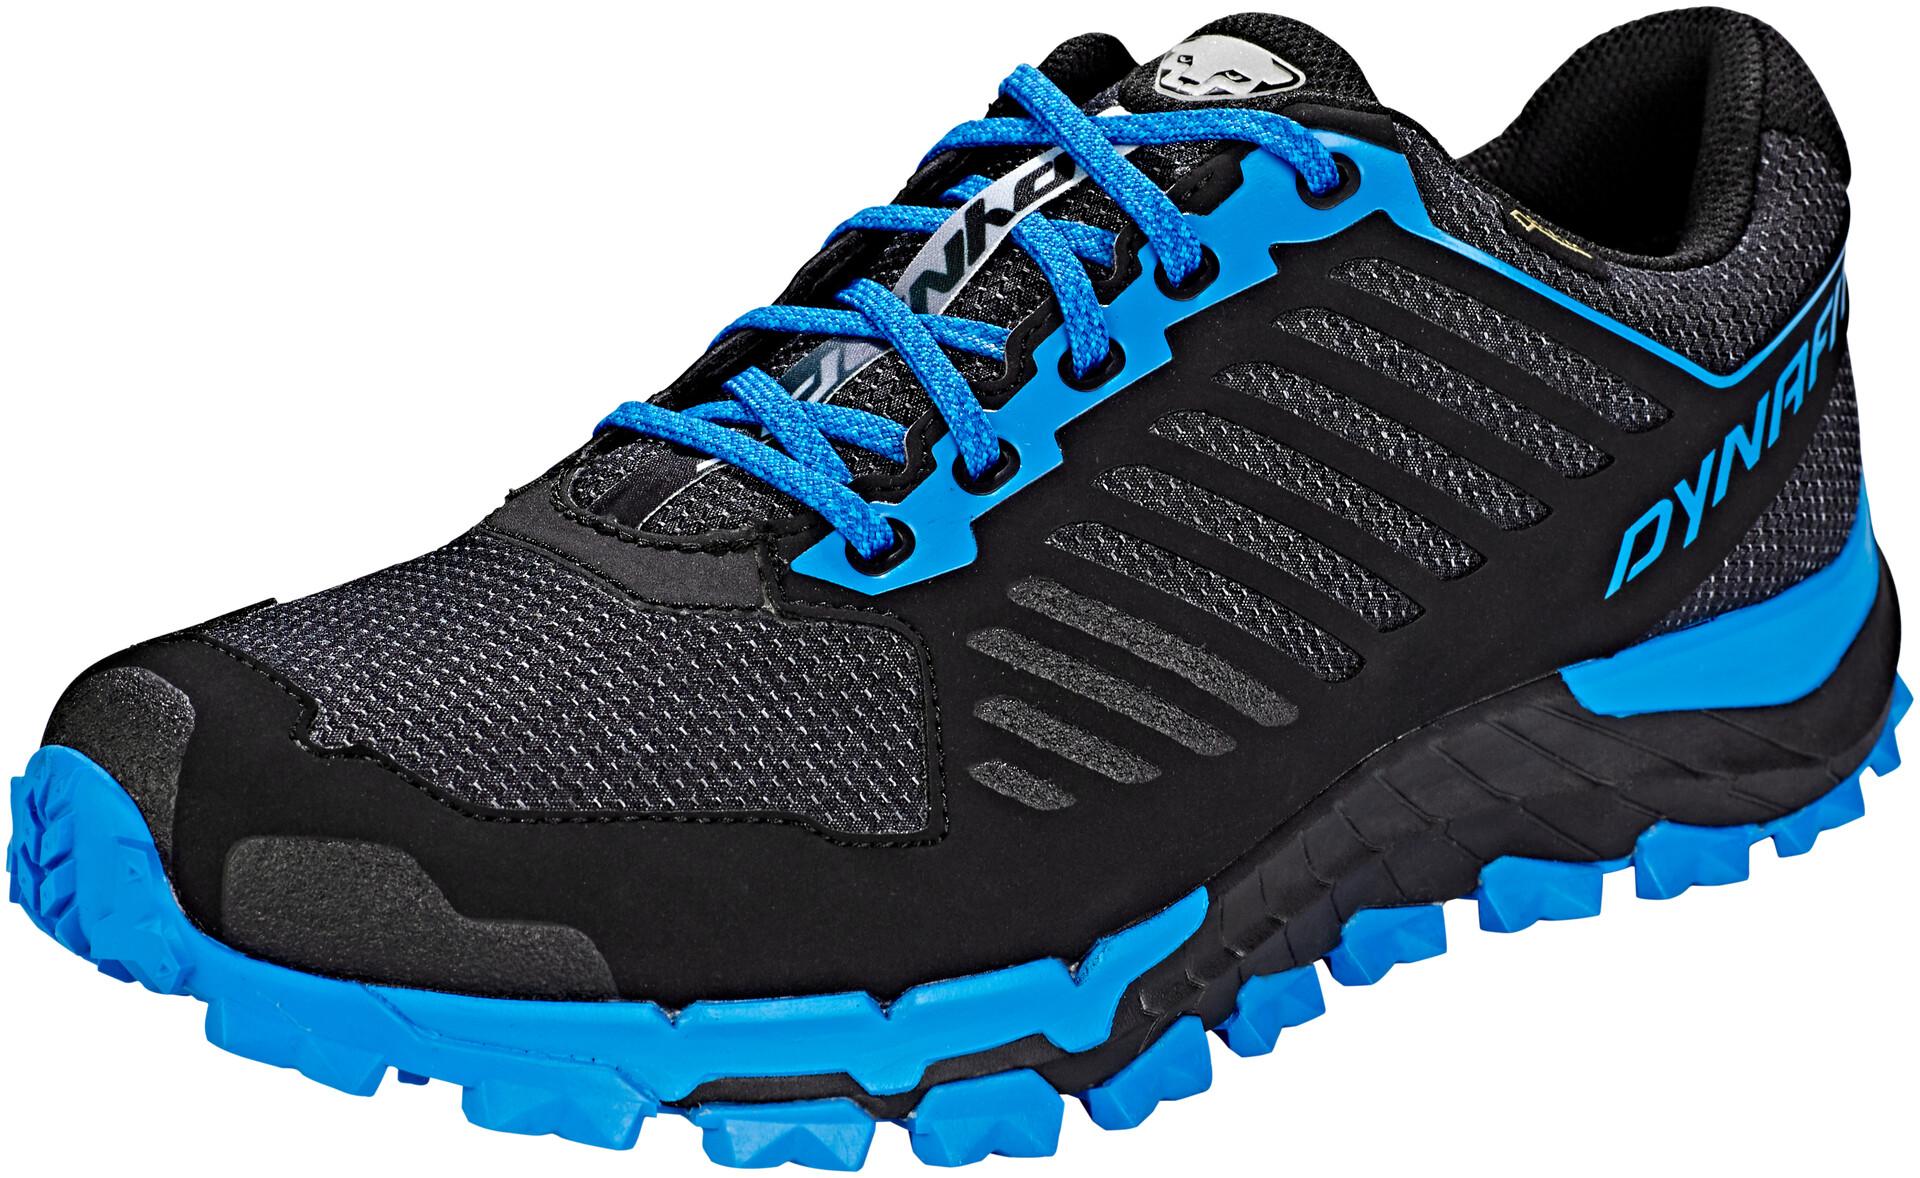 e6488caeaa4 Dynafit trailbreaker gore tex zapatillas running hombre azul negro sendas  crocs tallas tabla jpg 1920x1178 Sendas